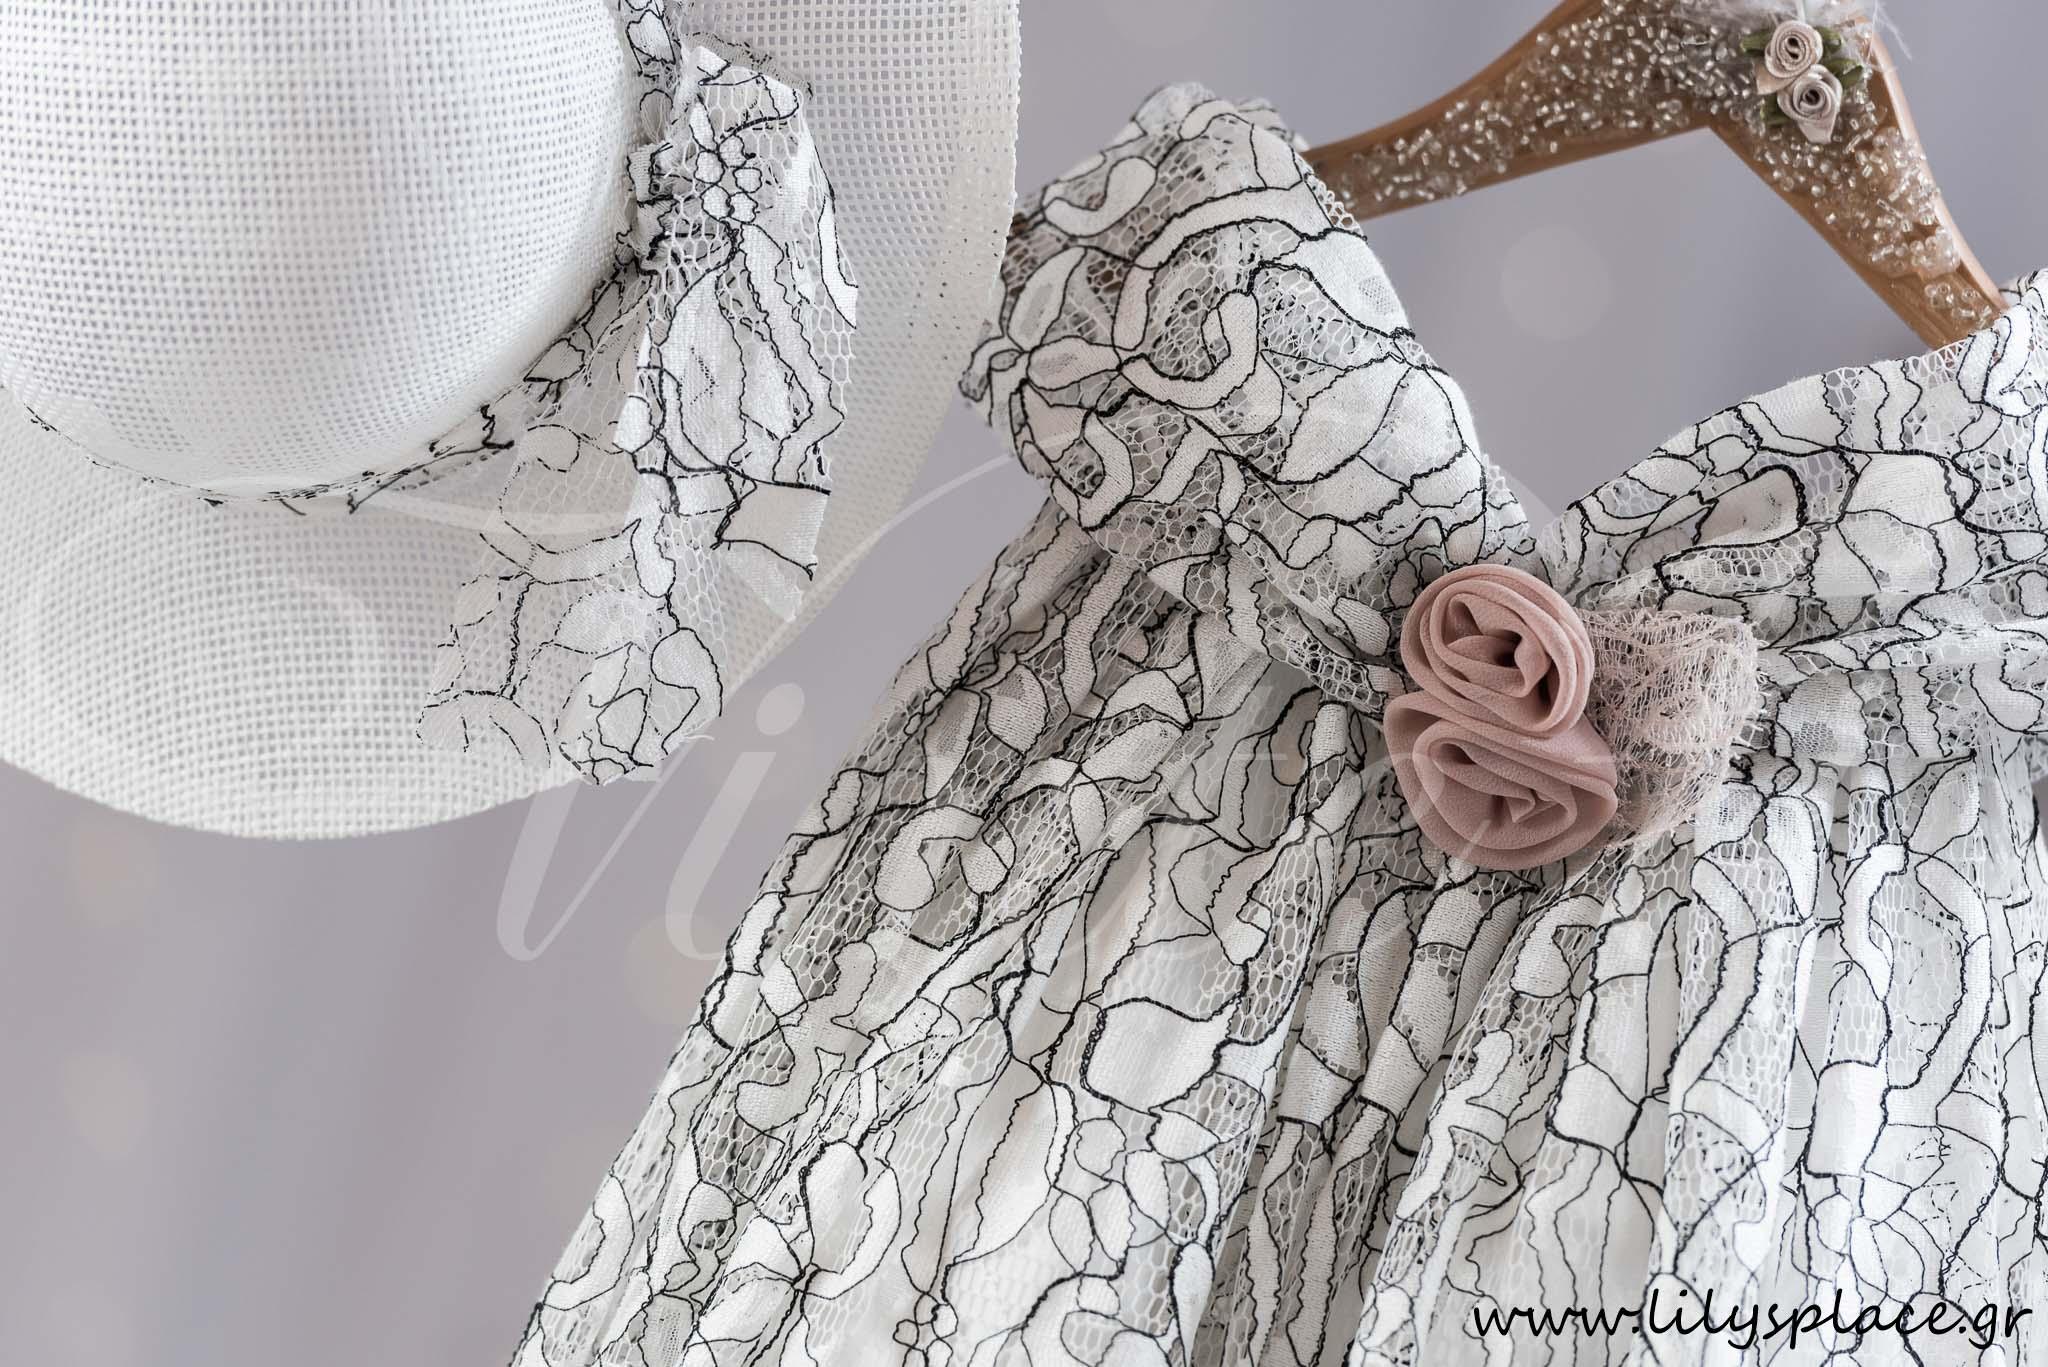 388675ae06a2 Ρούχο βάπτισης φόρεμα με δαντέλα κορδονέ